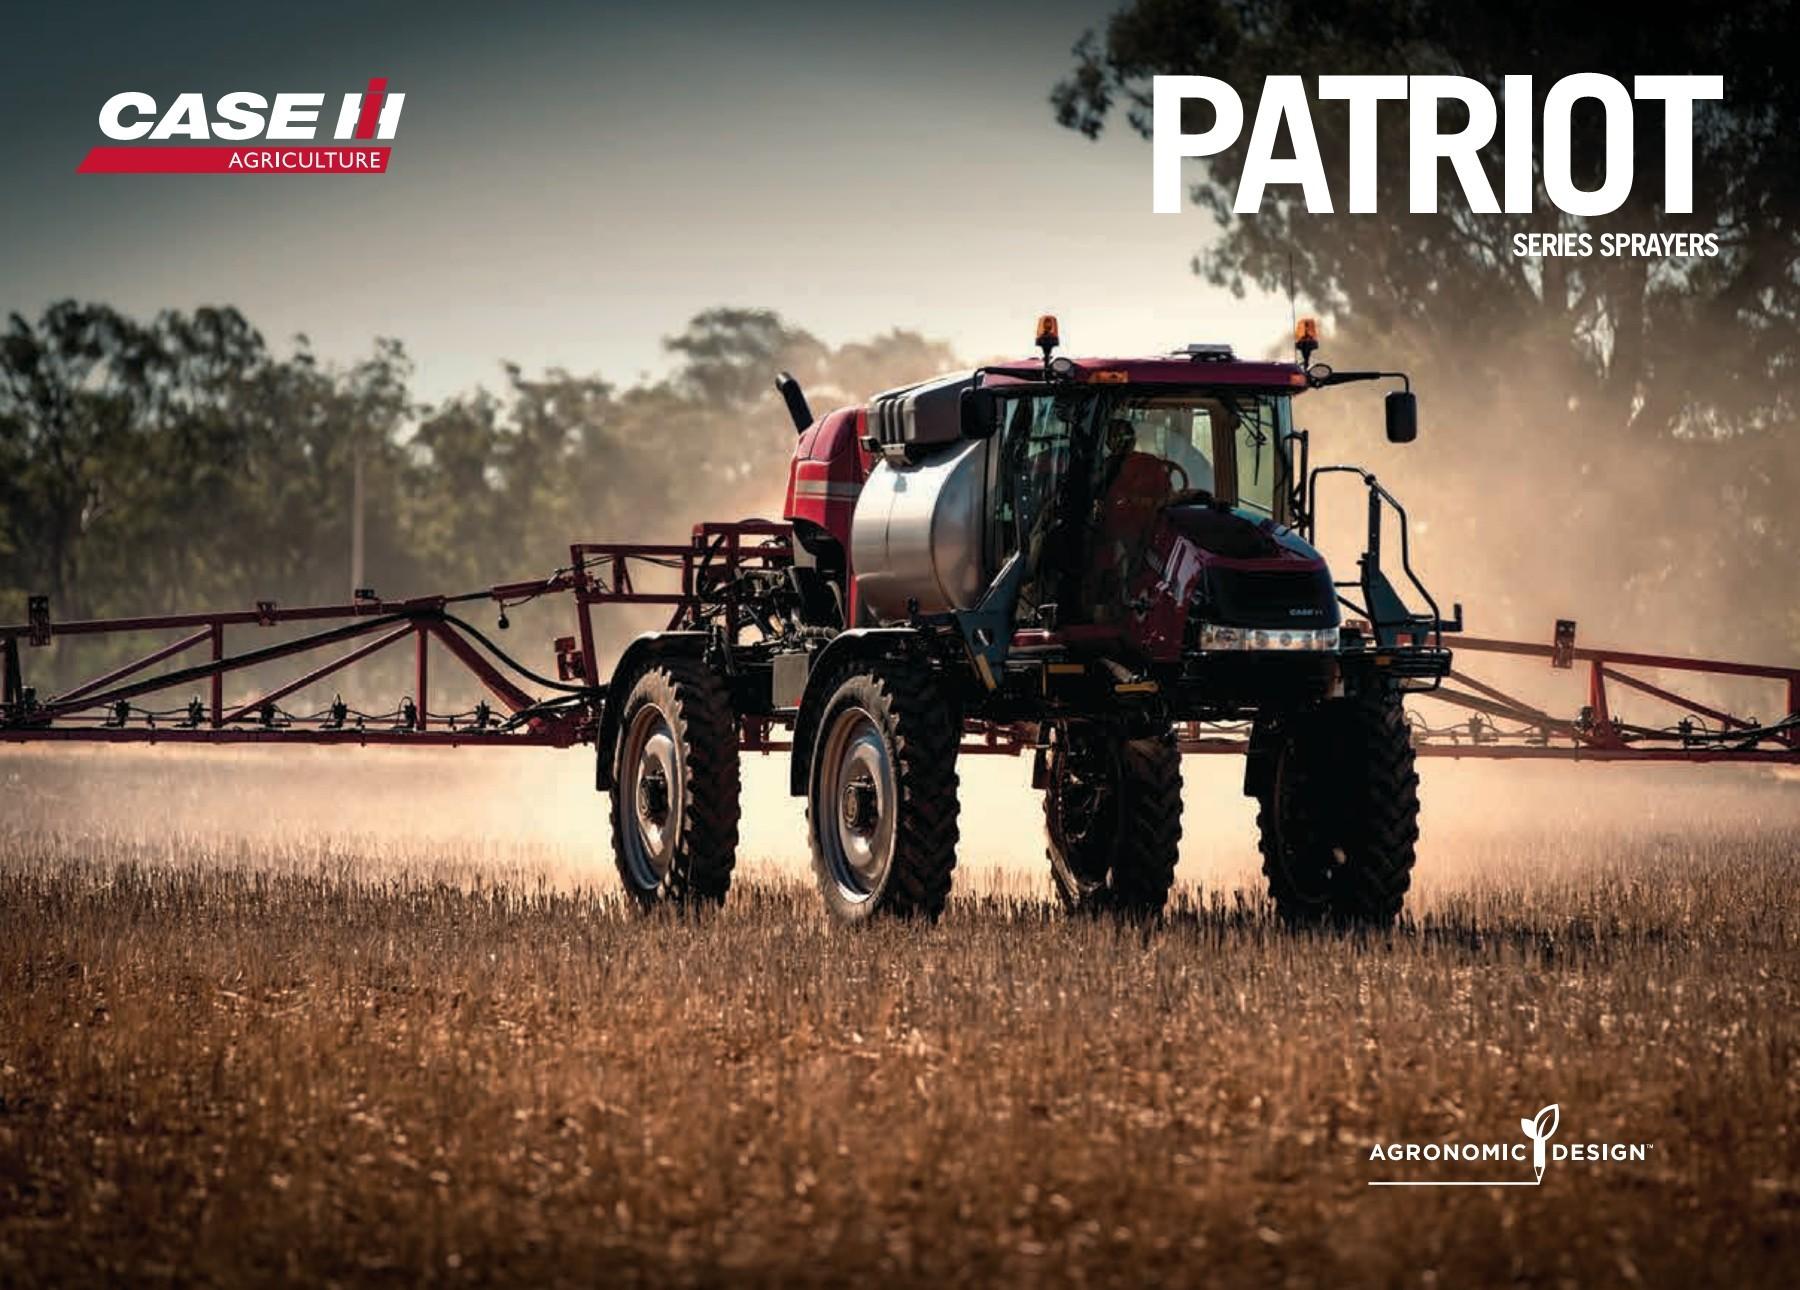 Patriot Series Sprayers | Case IH